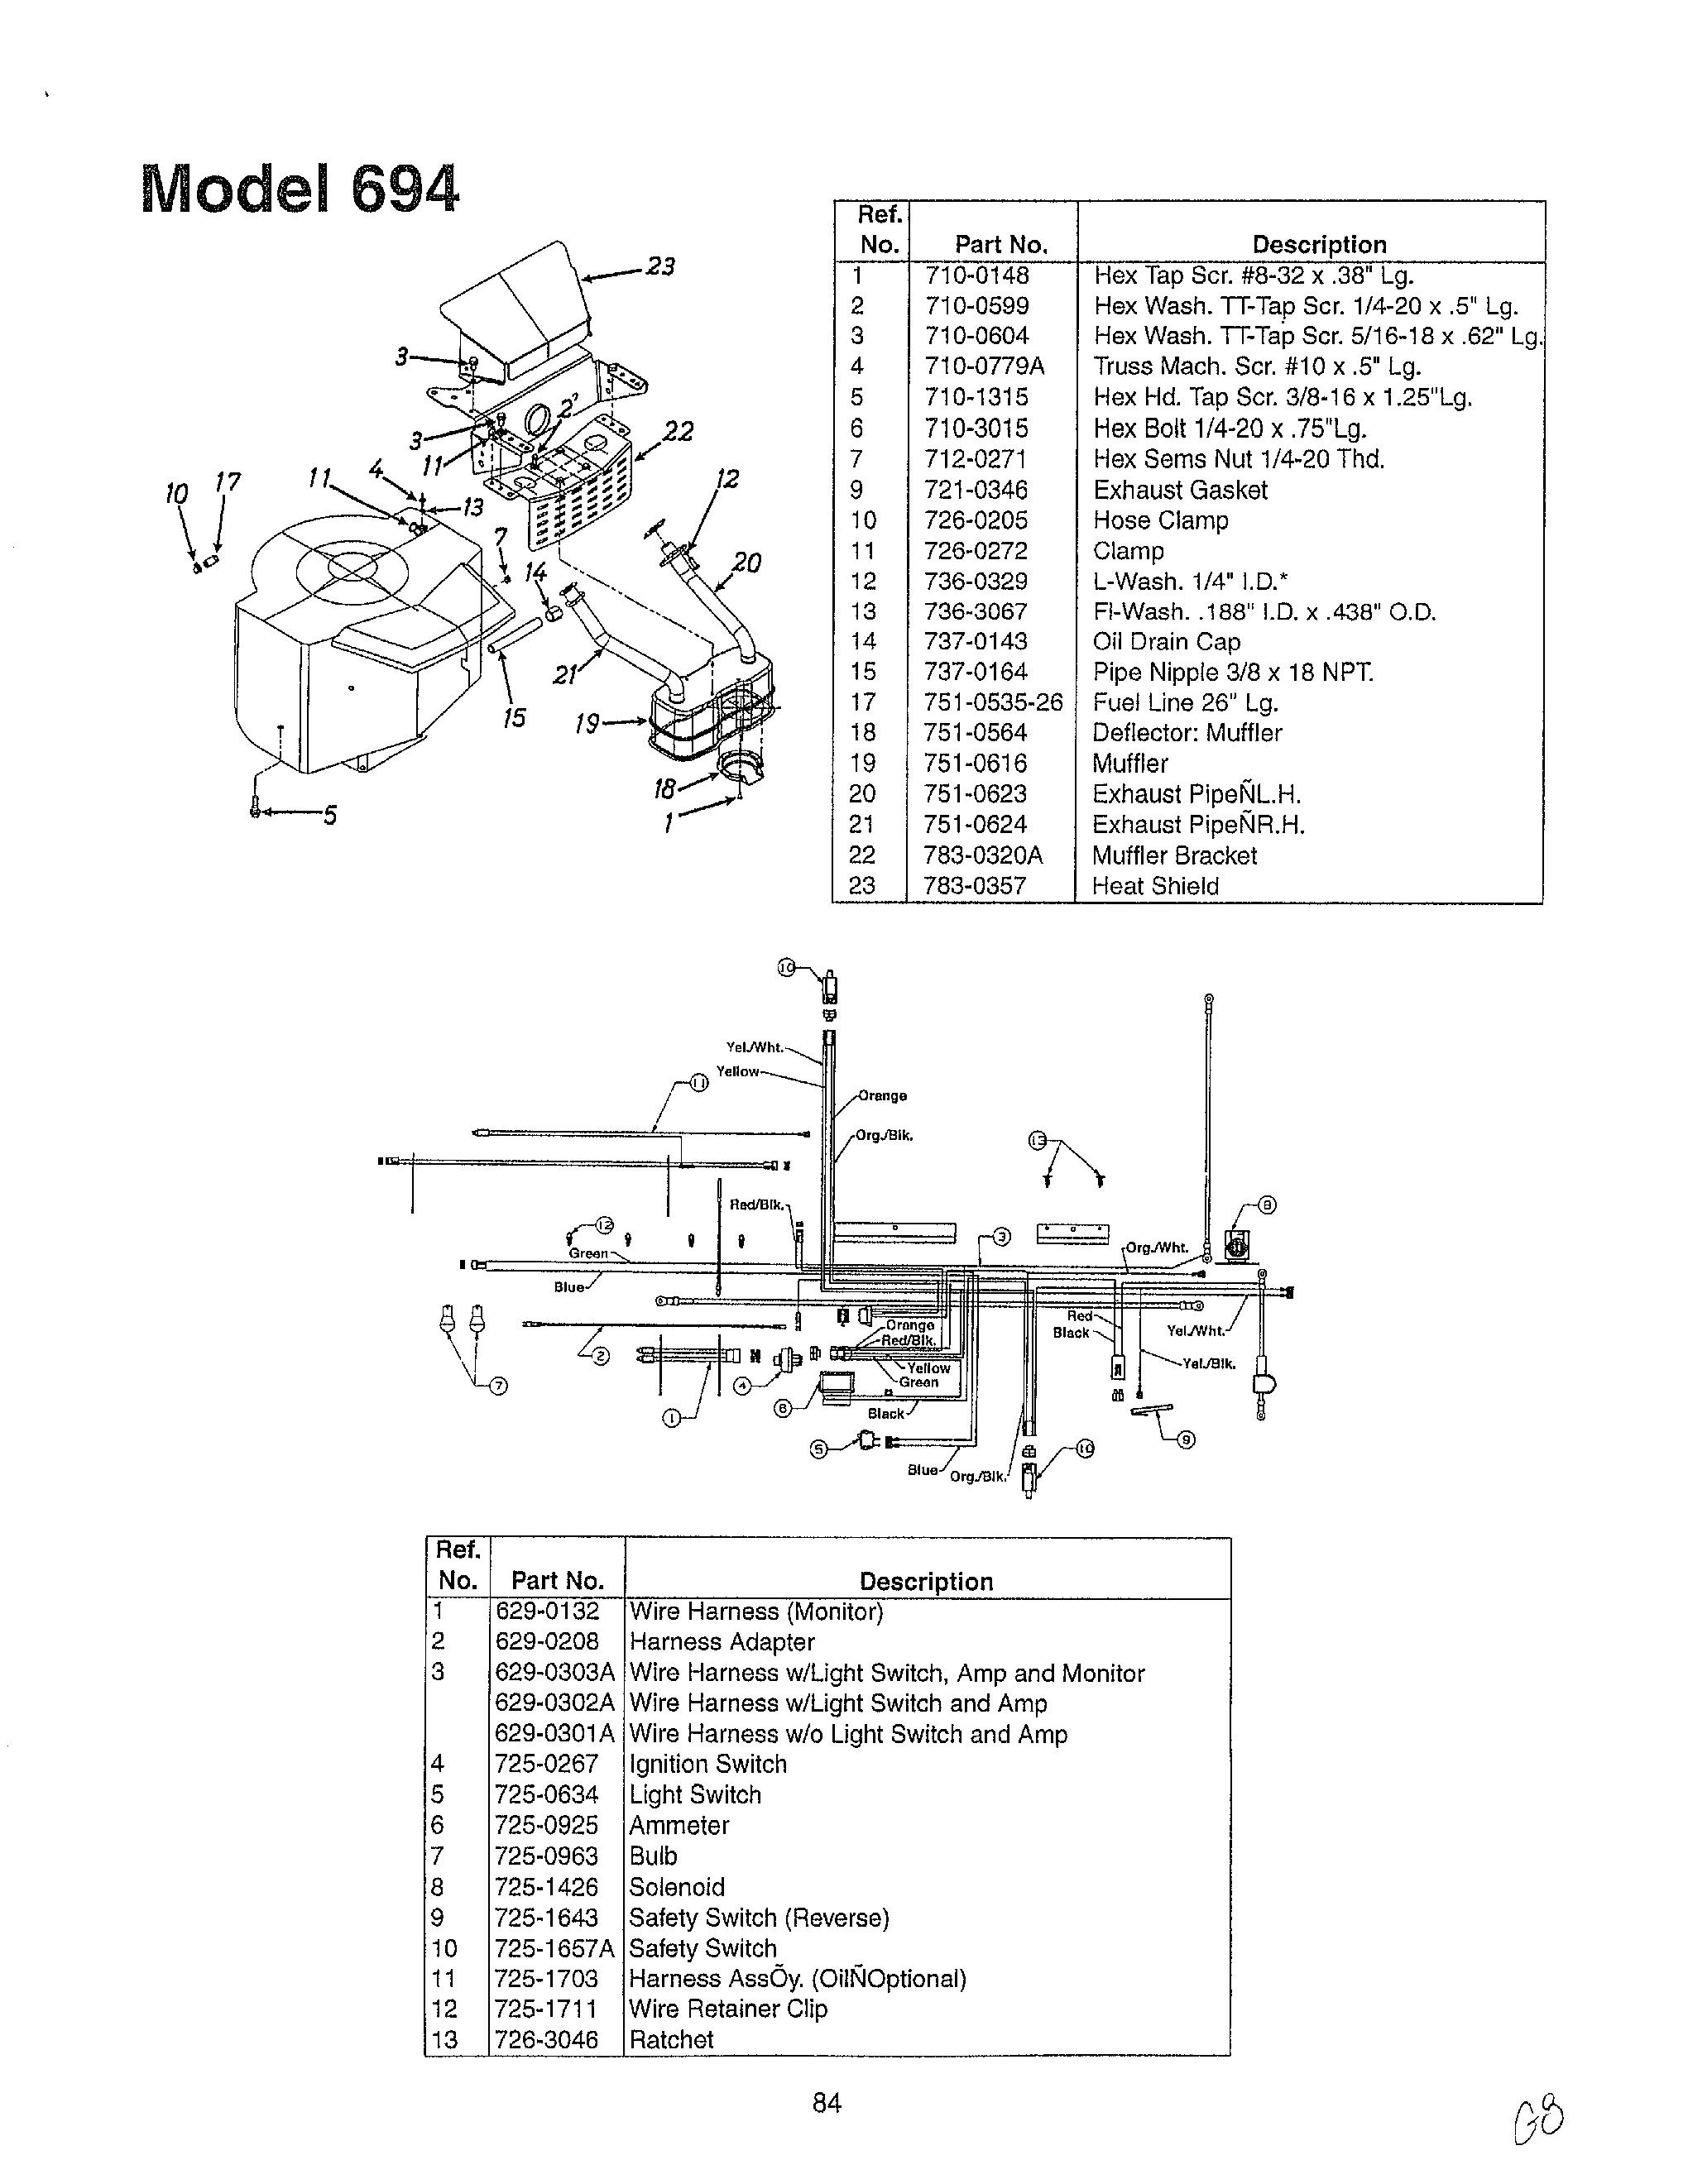 Wfe515s0es0 Wiring Diagram